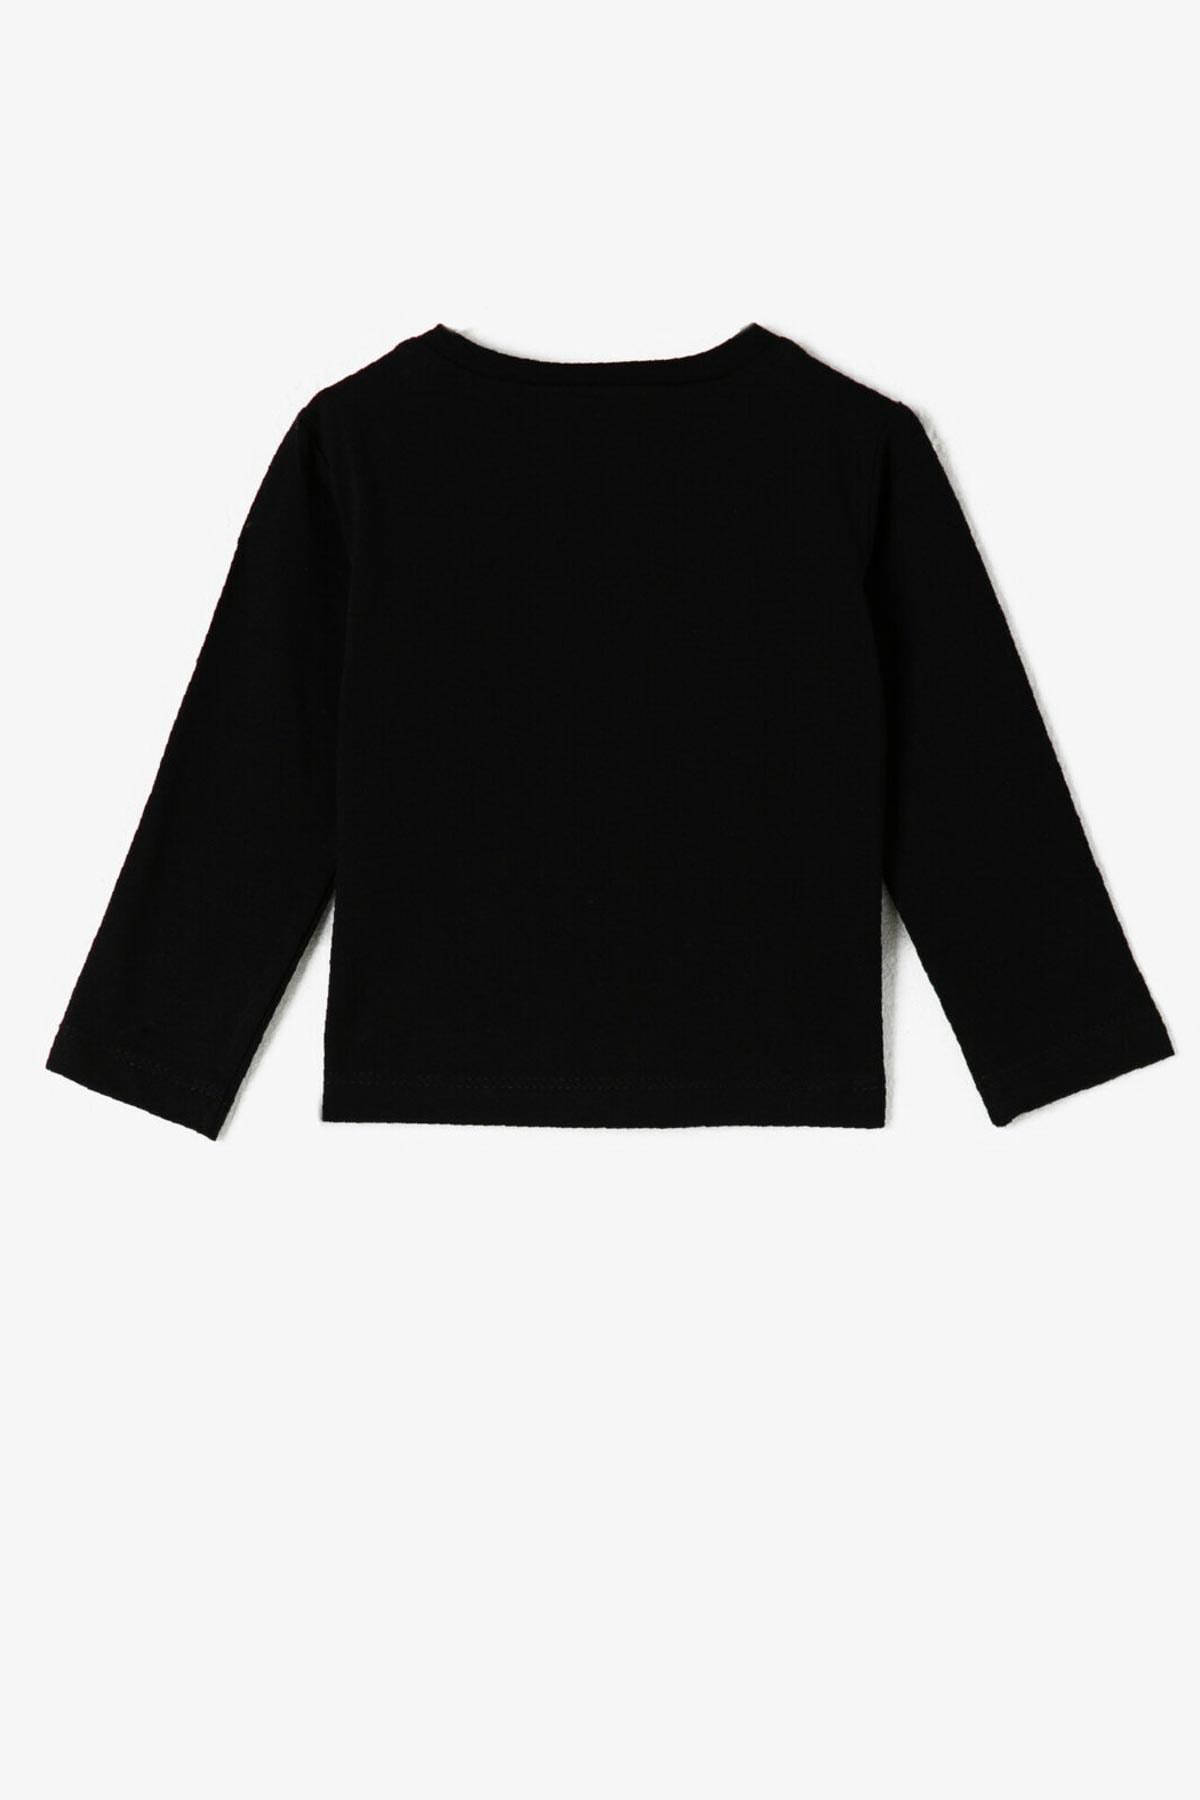 Koton Kids Siyah Erkek Bebek T-Shirt 2